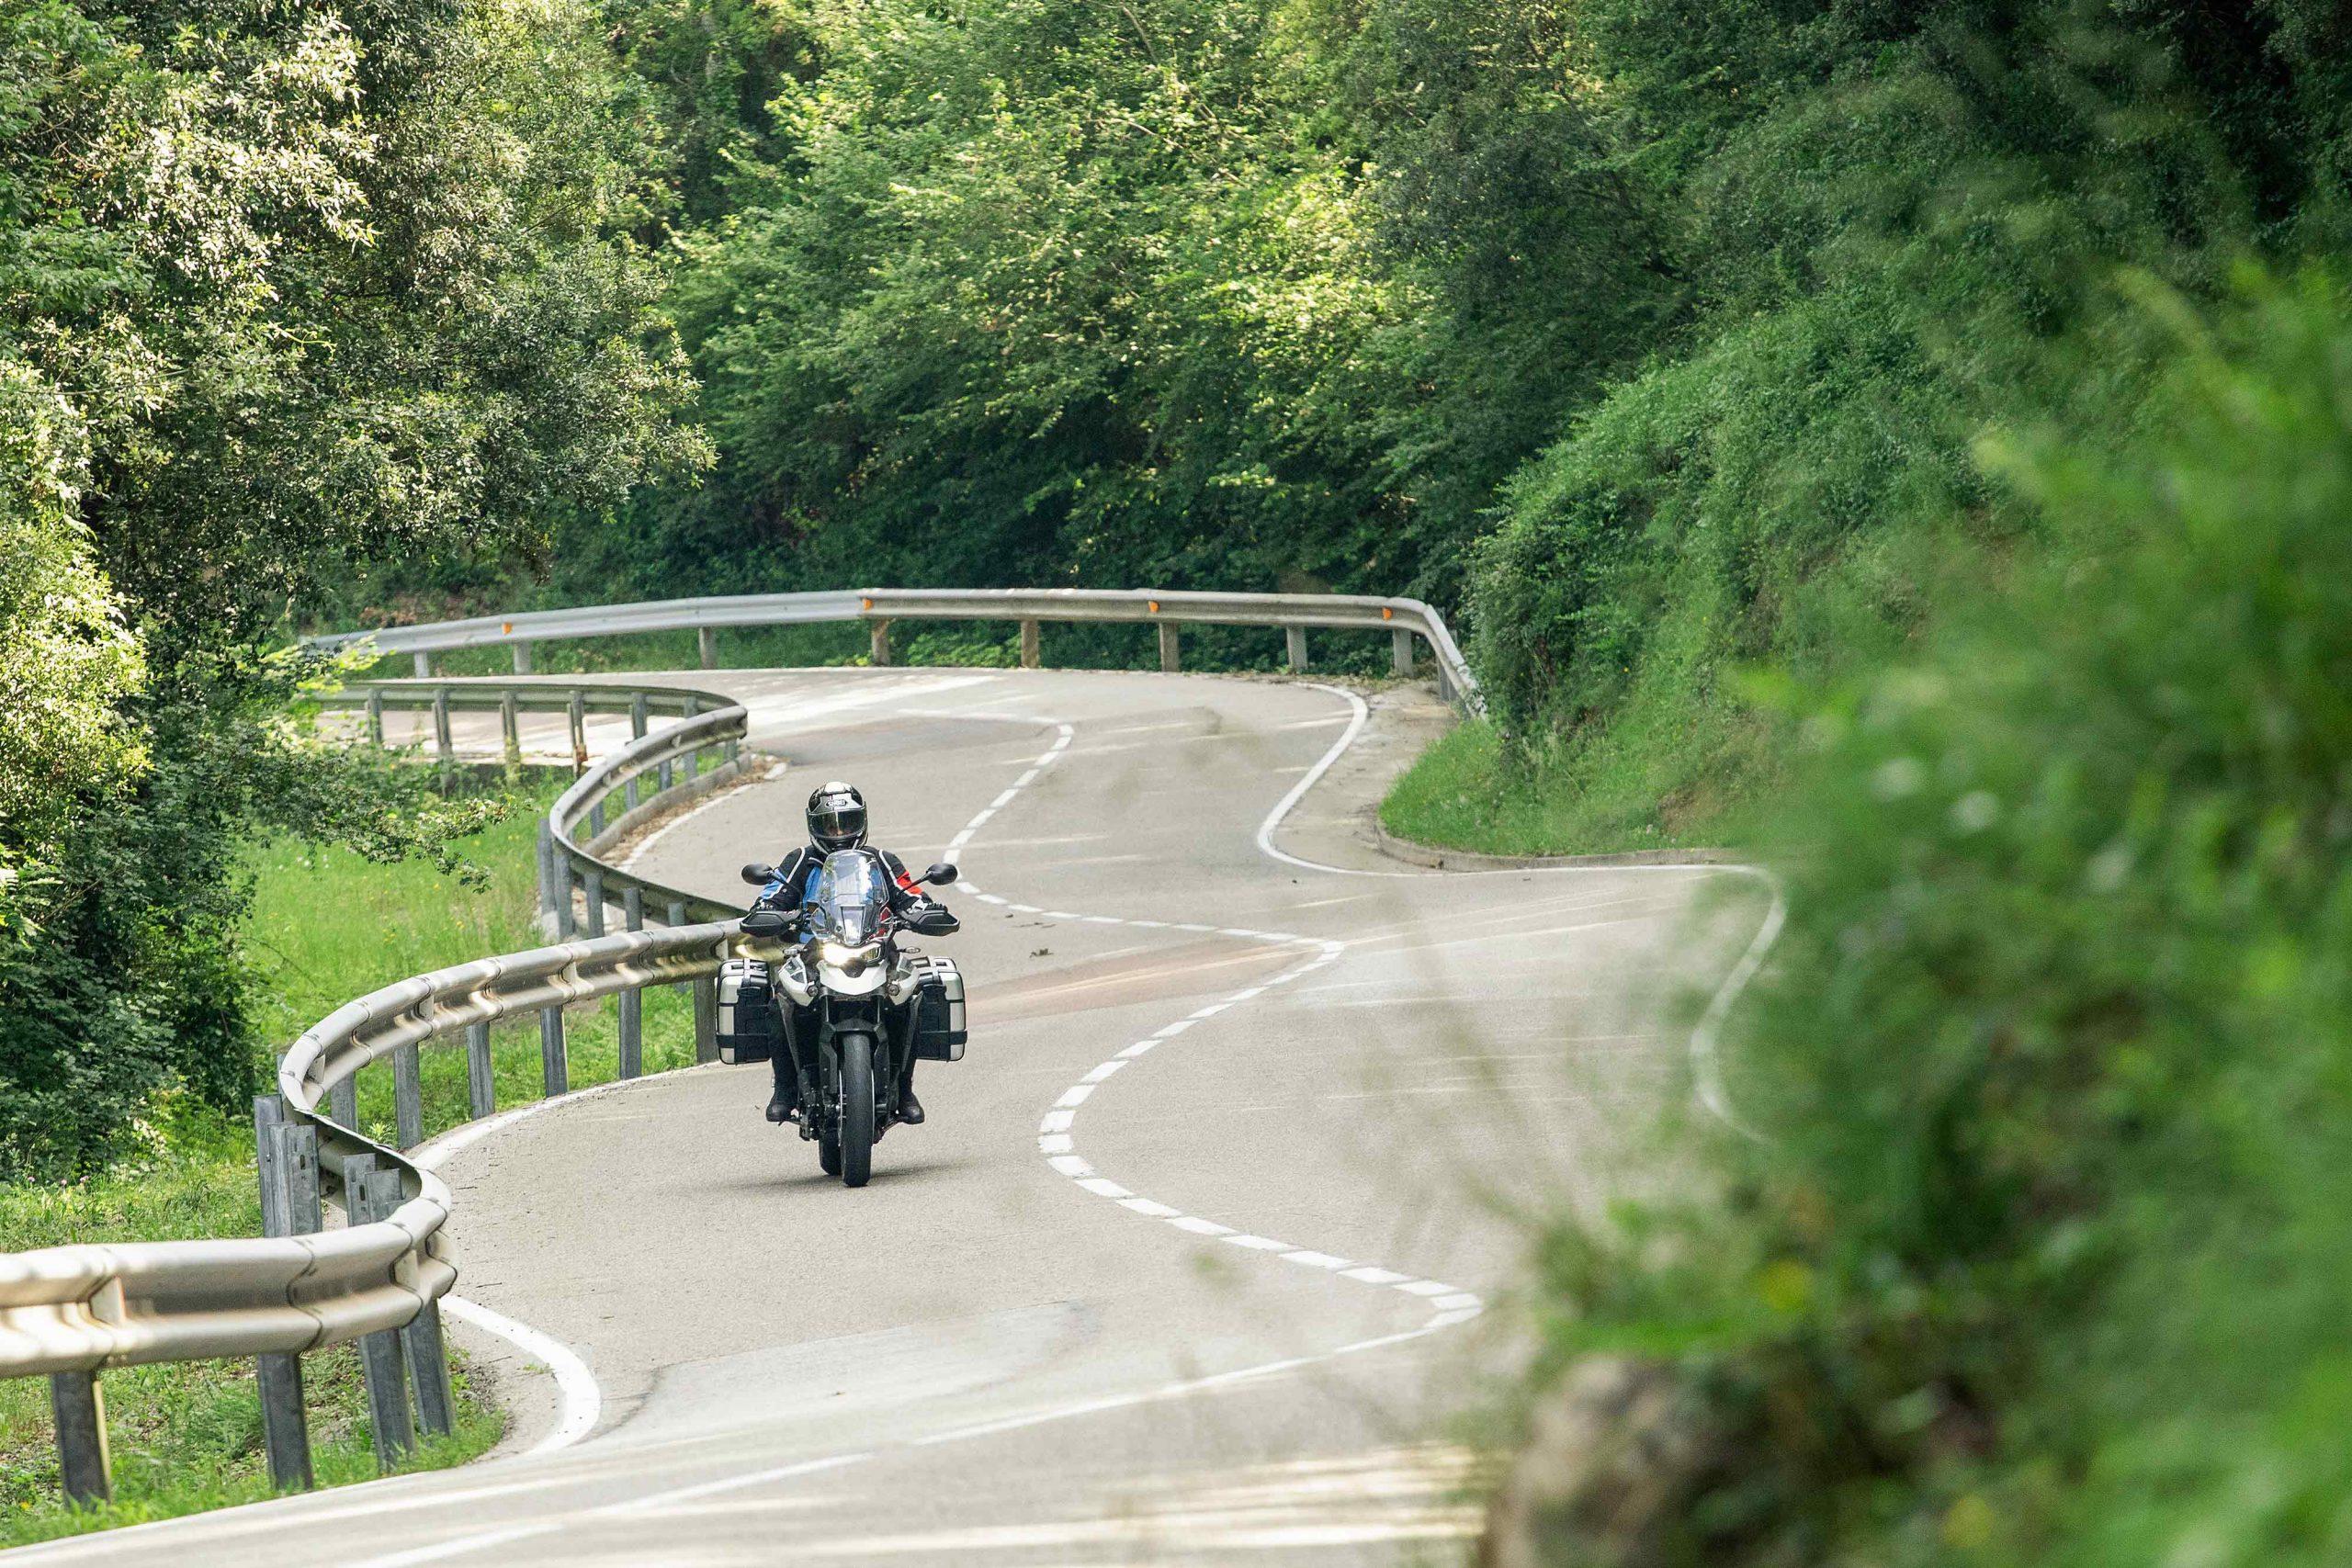 009_TriumphTiger-motosnet-mariapujol-fotografobarcelona